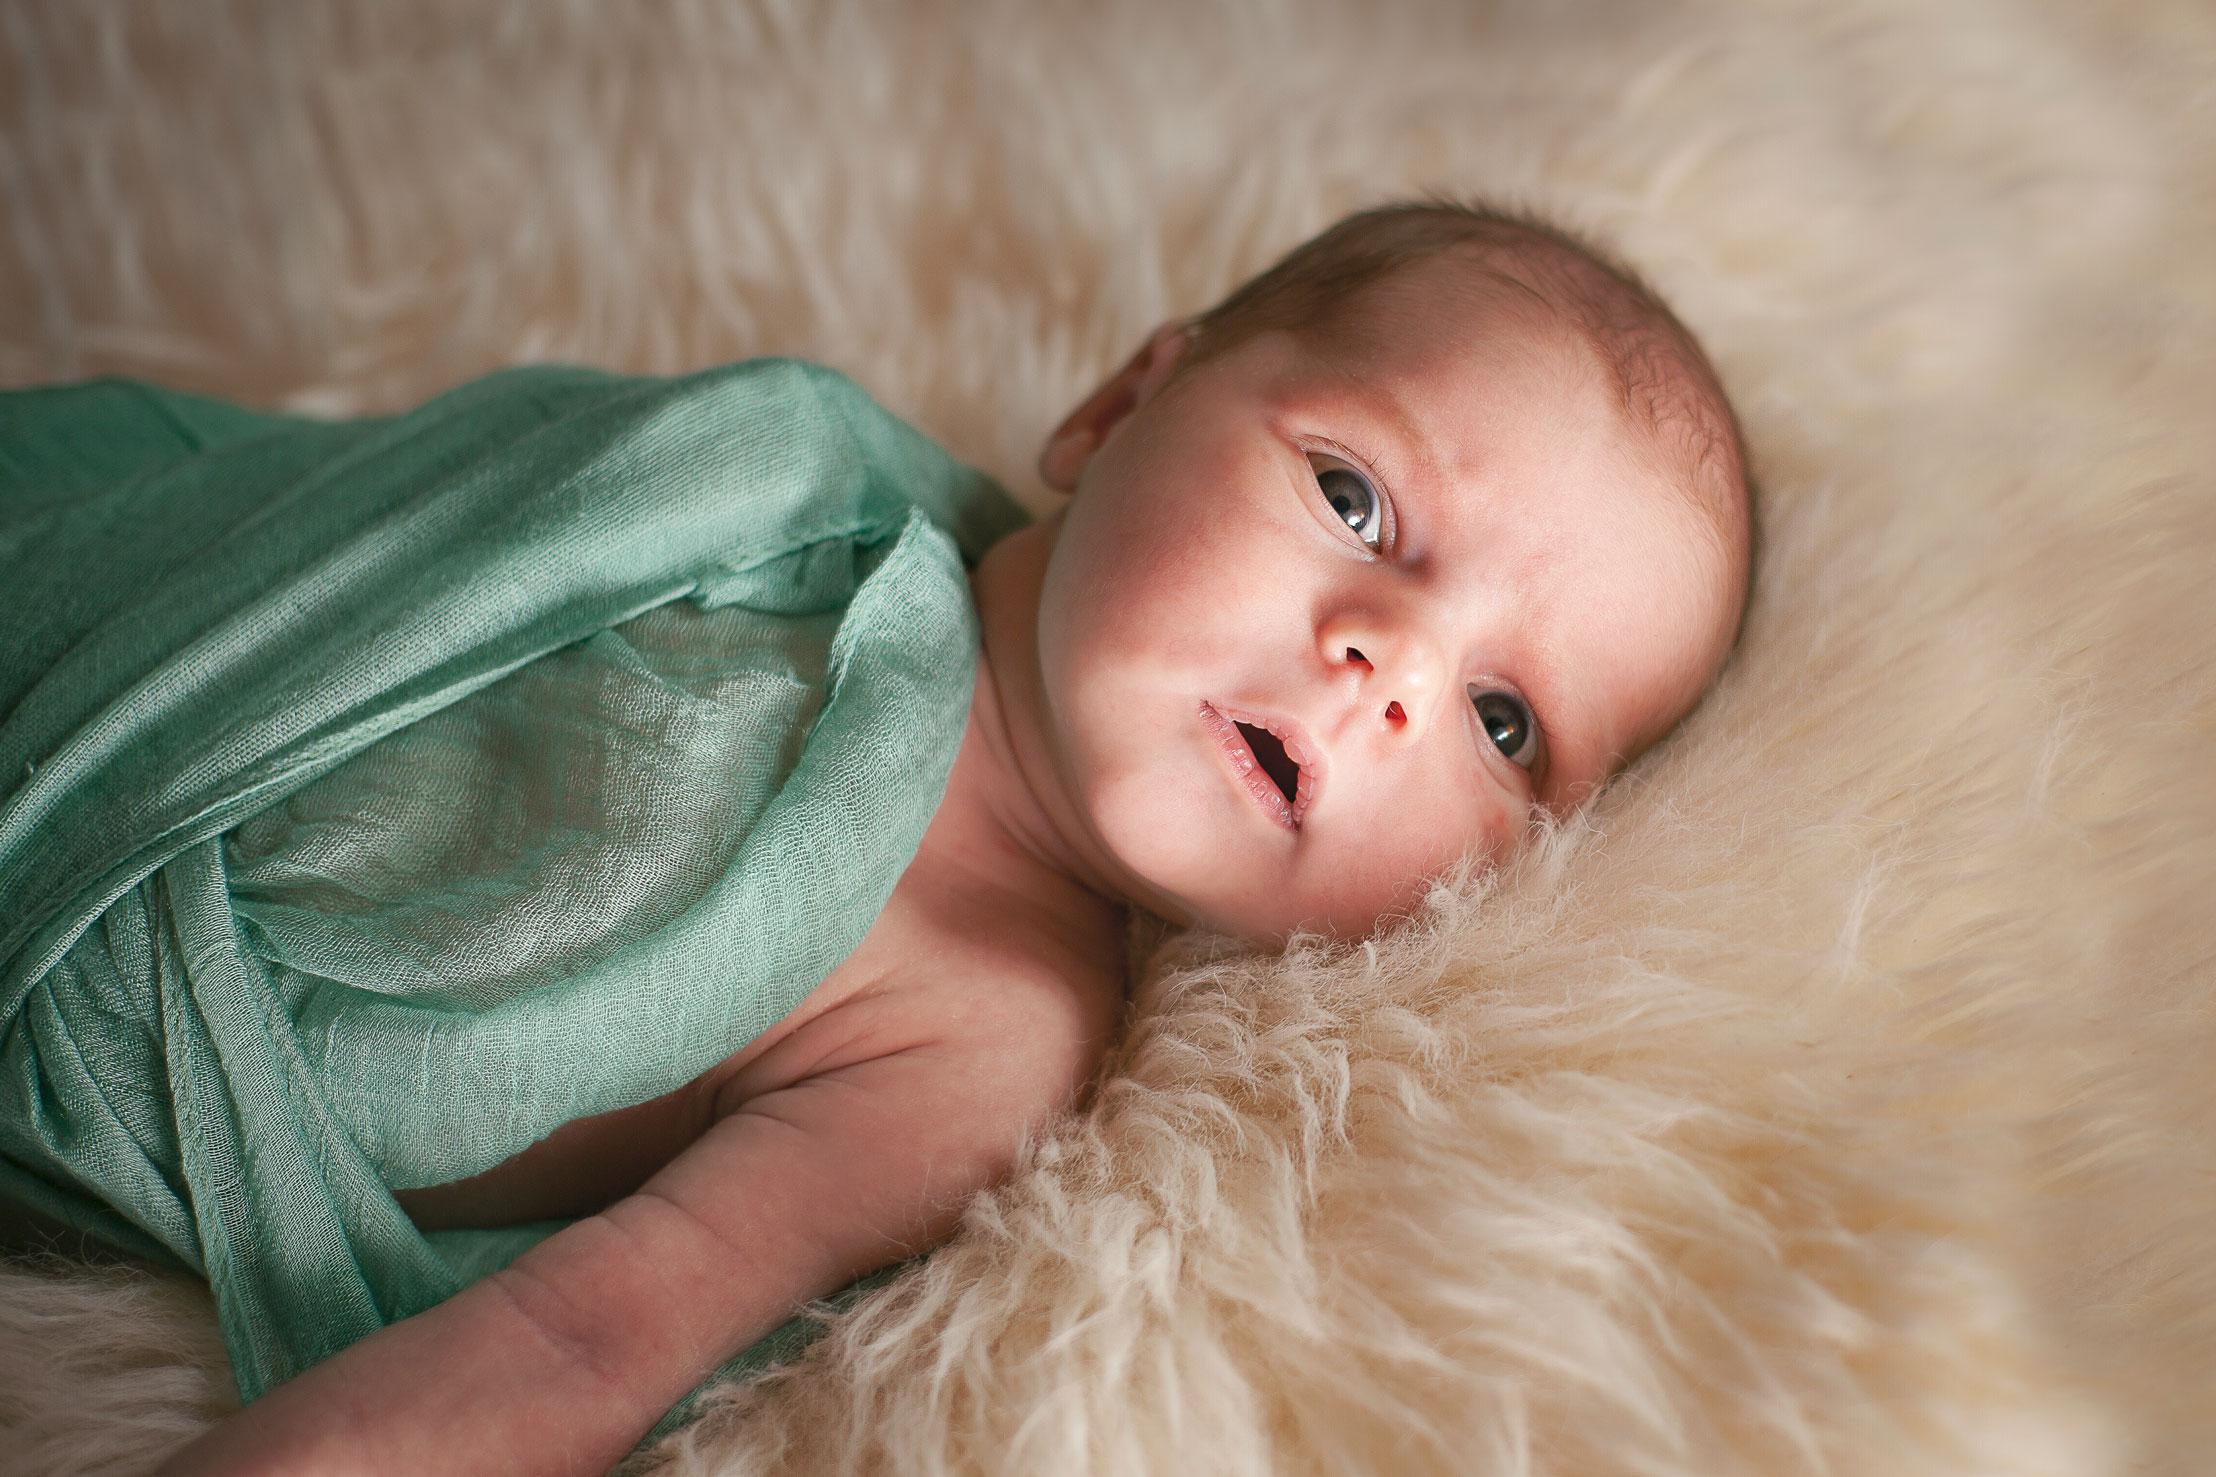 Babyfotos Dresden Fotograf Dresden Babyshooting Dresden Neugeborenenfotos Dresden Neugeborenenshooting